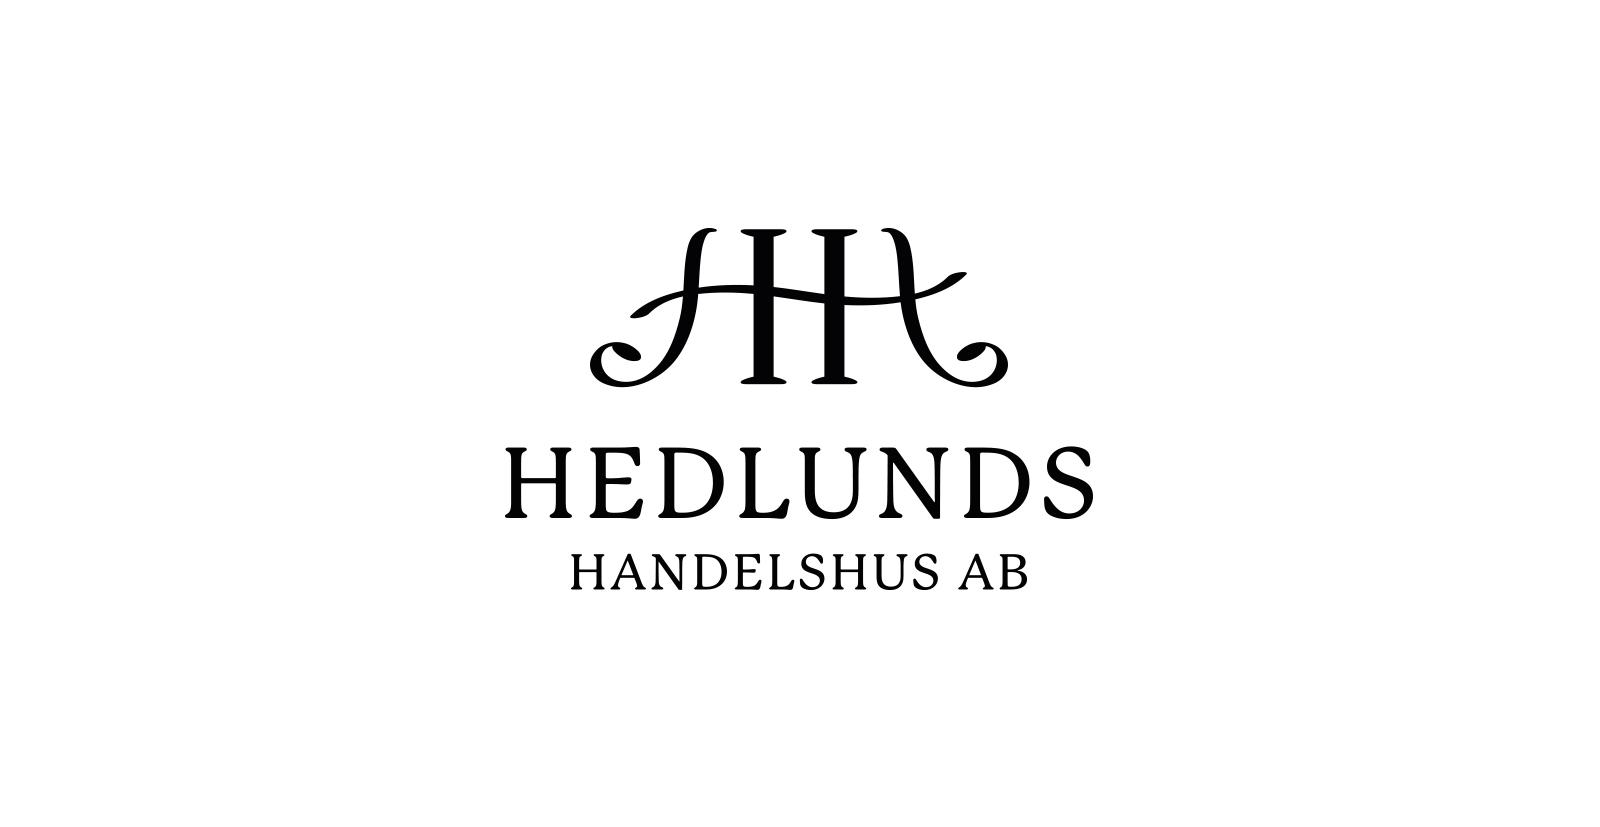 Hedlunds_Handelshus-logo-Mia_Olofsson_01